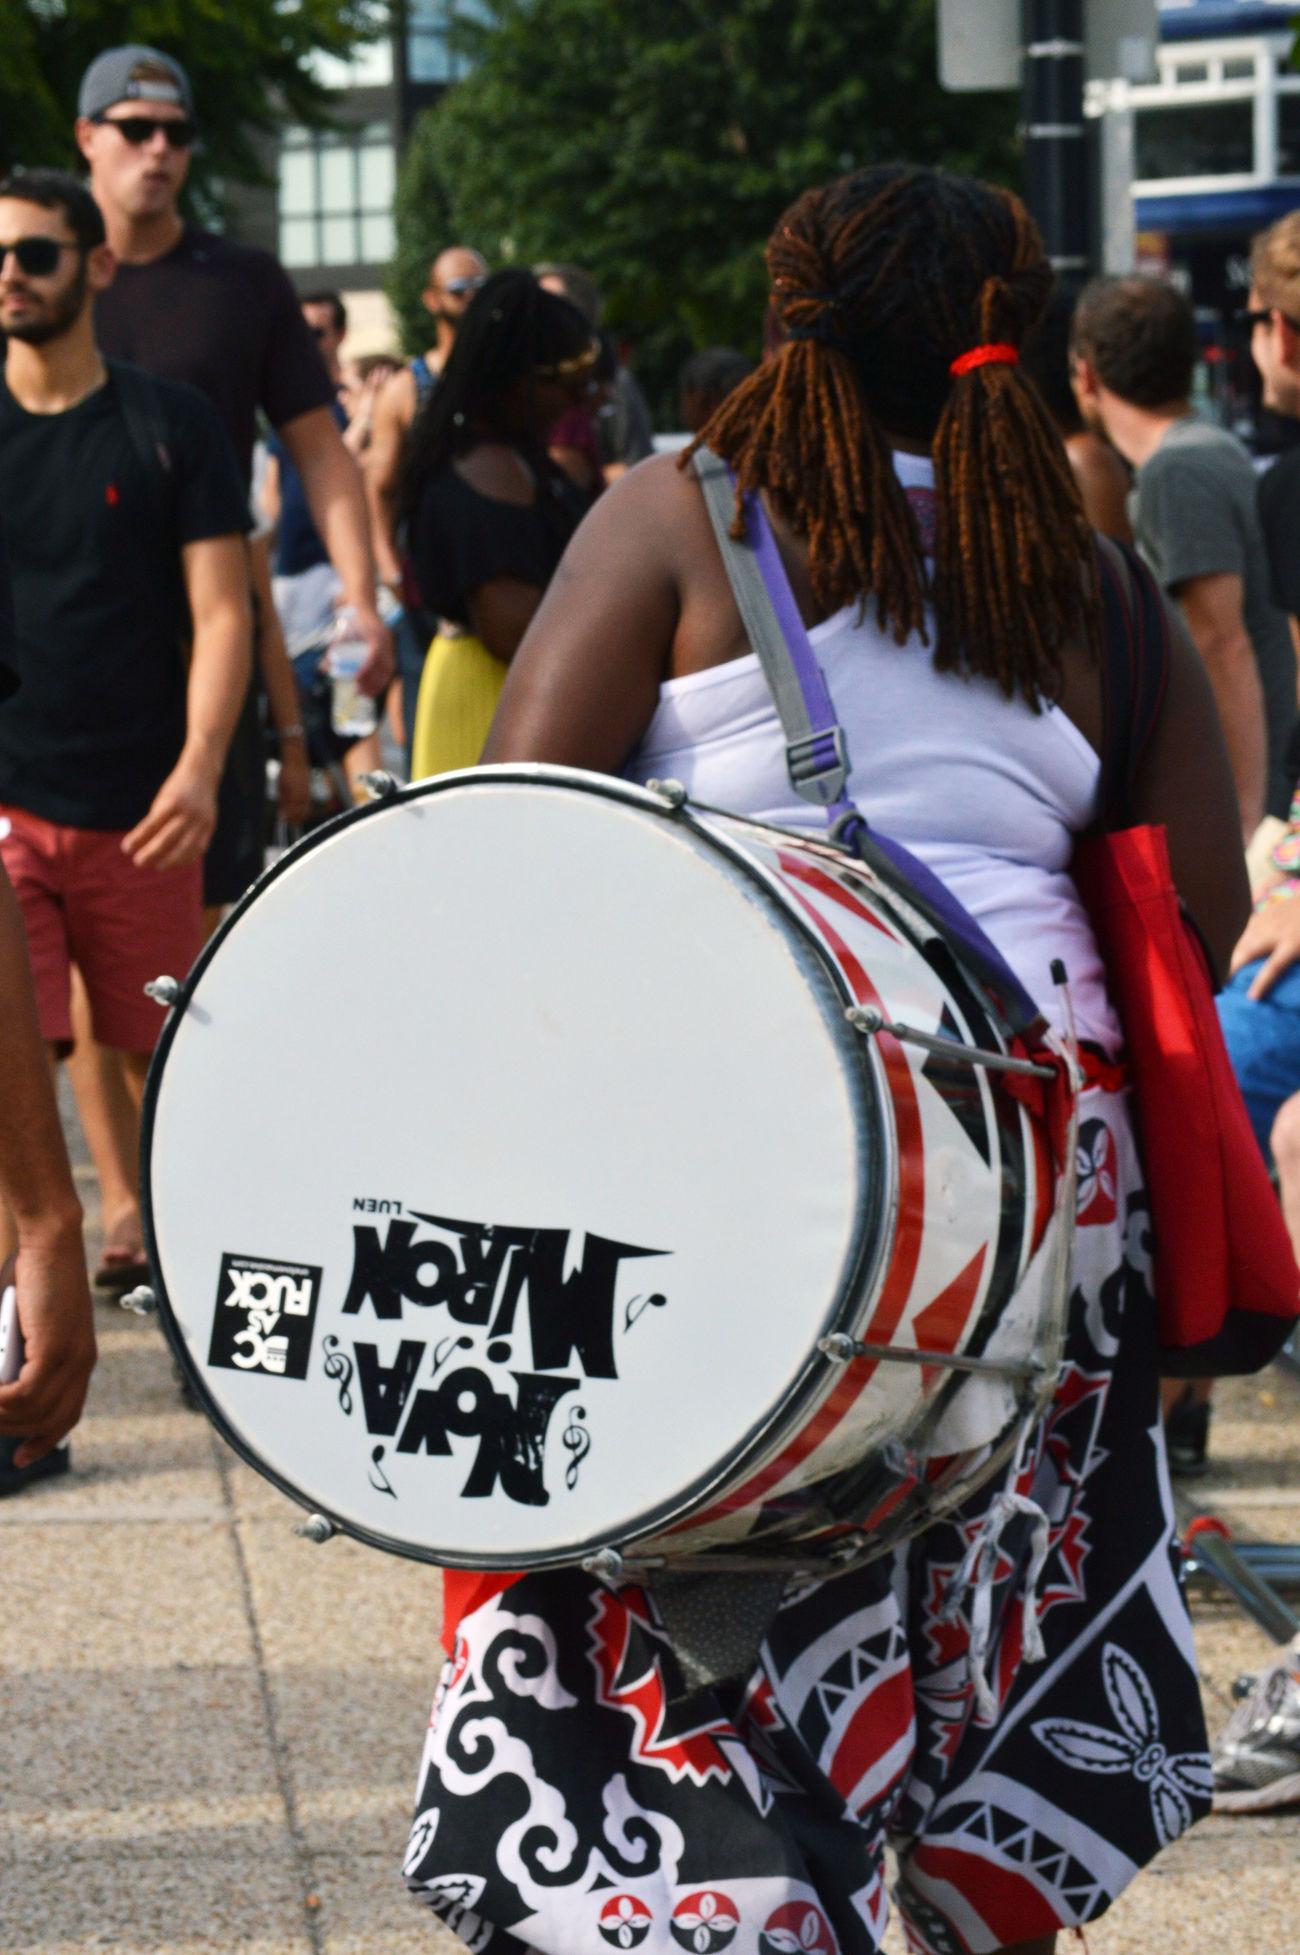 Candid Candid Photography Drummer Drummer Girl DrummerGirl Instrument Musician Washington, D. C. Streetphotography Street Photography Adamsmorgan